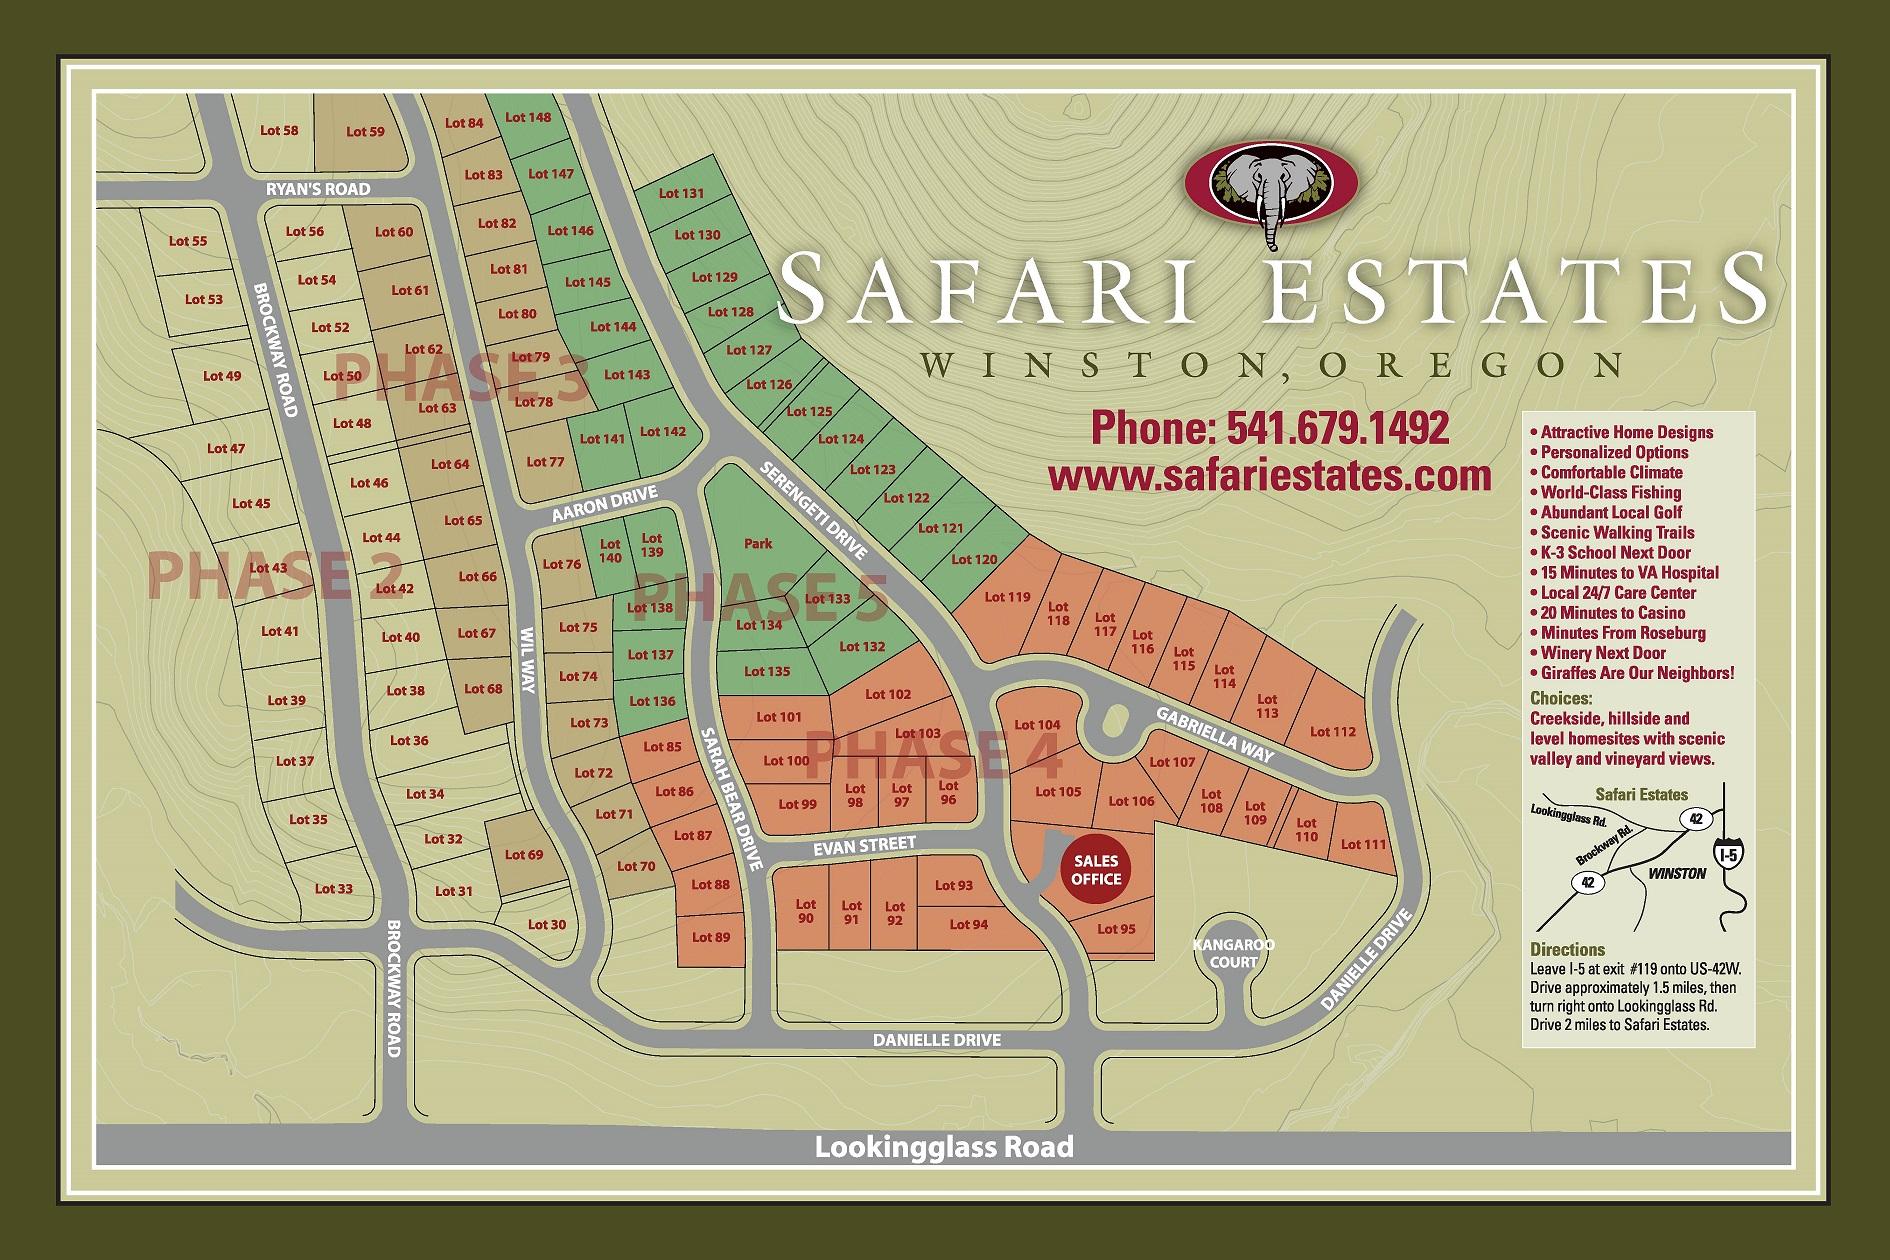 Plat-pic-Safari-Estates3.jpg